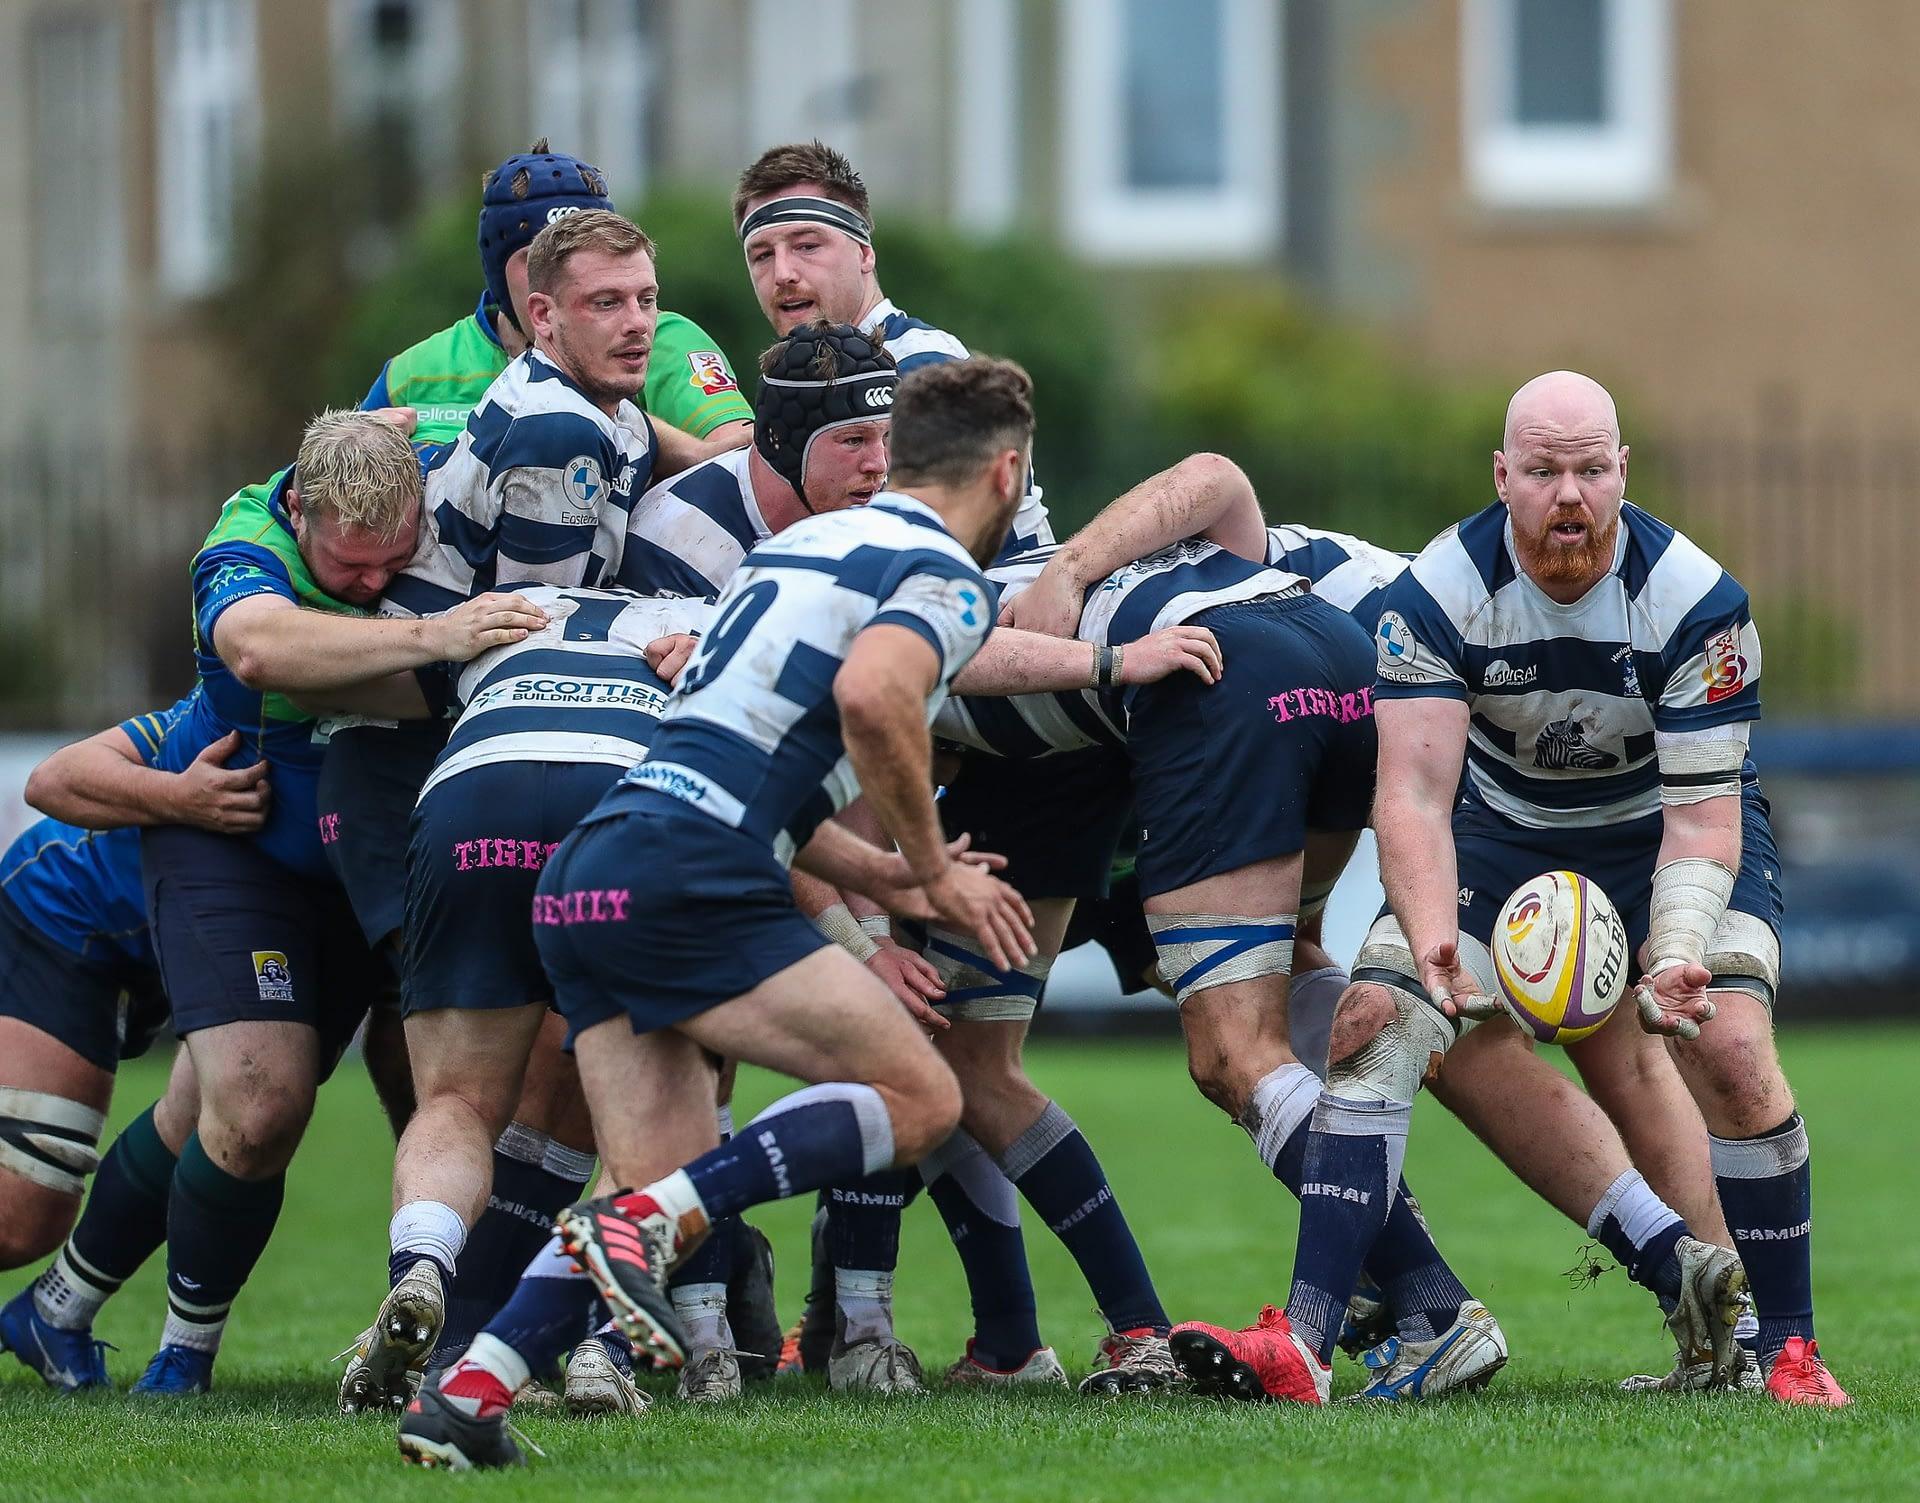 Heriots Jason Hill pops a pass to  Lloyd Wheeldon FOSROC Super 6 match between Heriot's Rugby and Boroughmuir Bears at Goldenacre, Edinburgh on 09/10/2021. (Photo: 39 Design Photography)